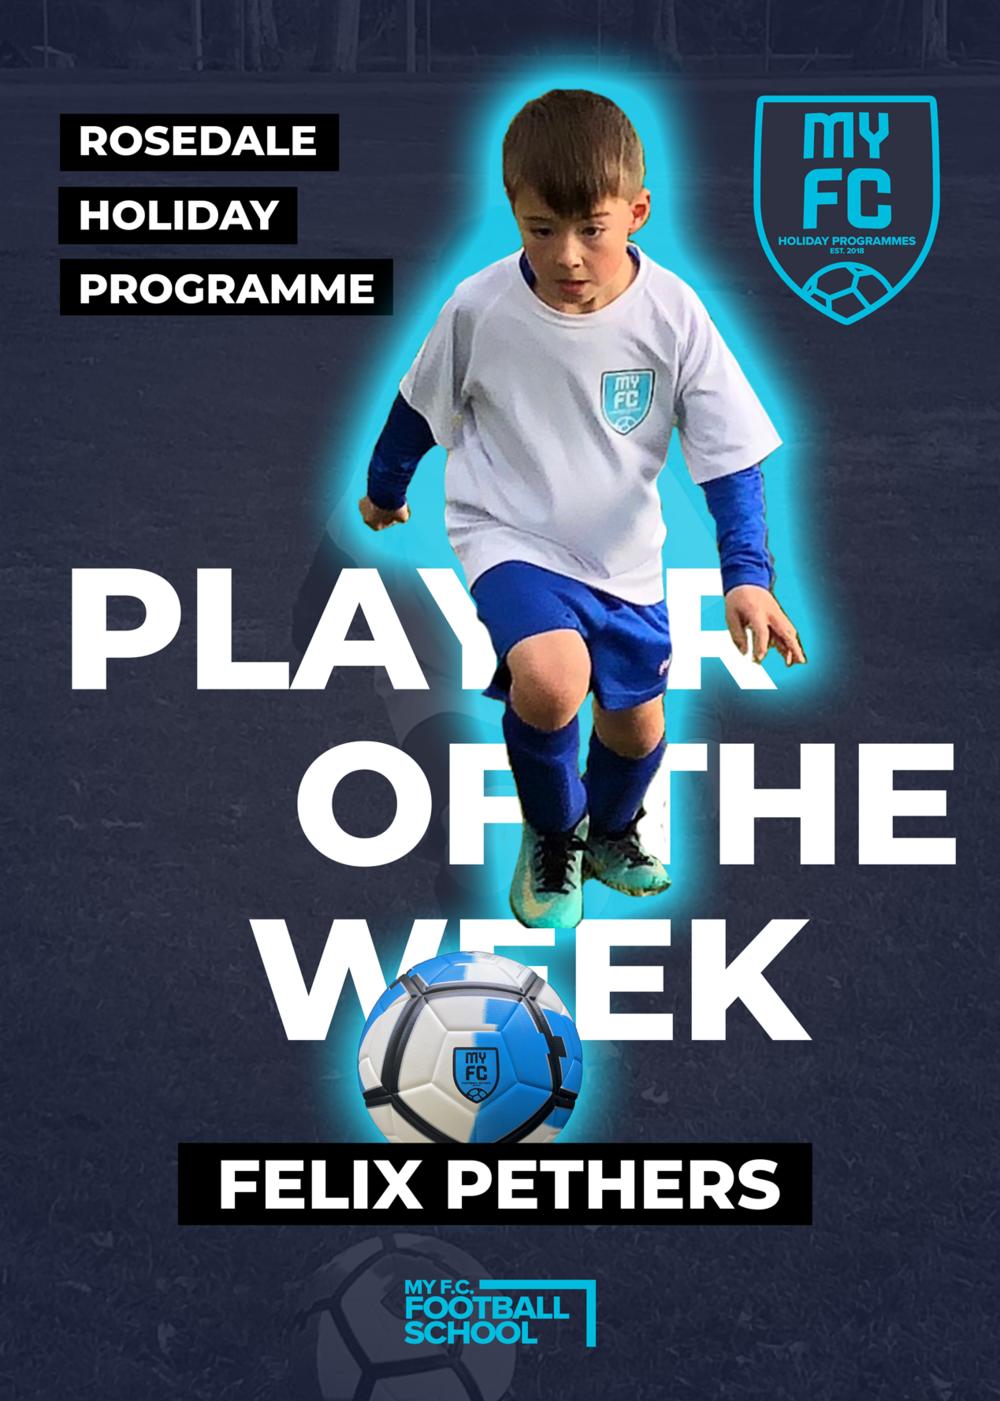 playeroftheweek_rosedale_felixpethers.png